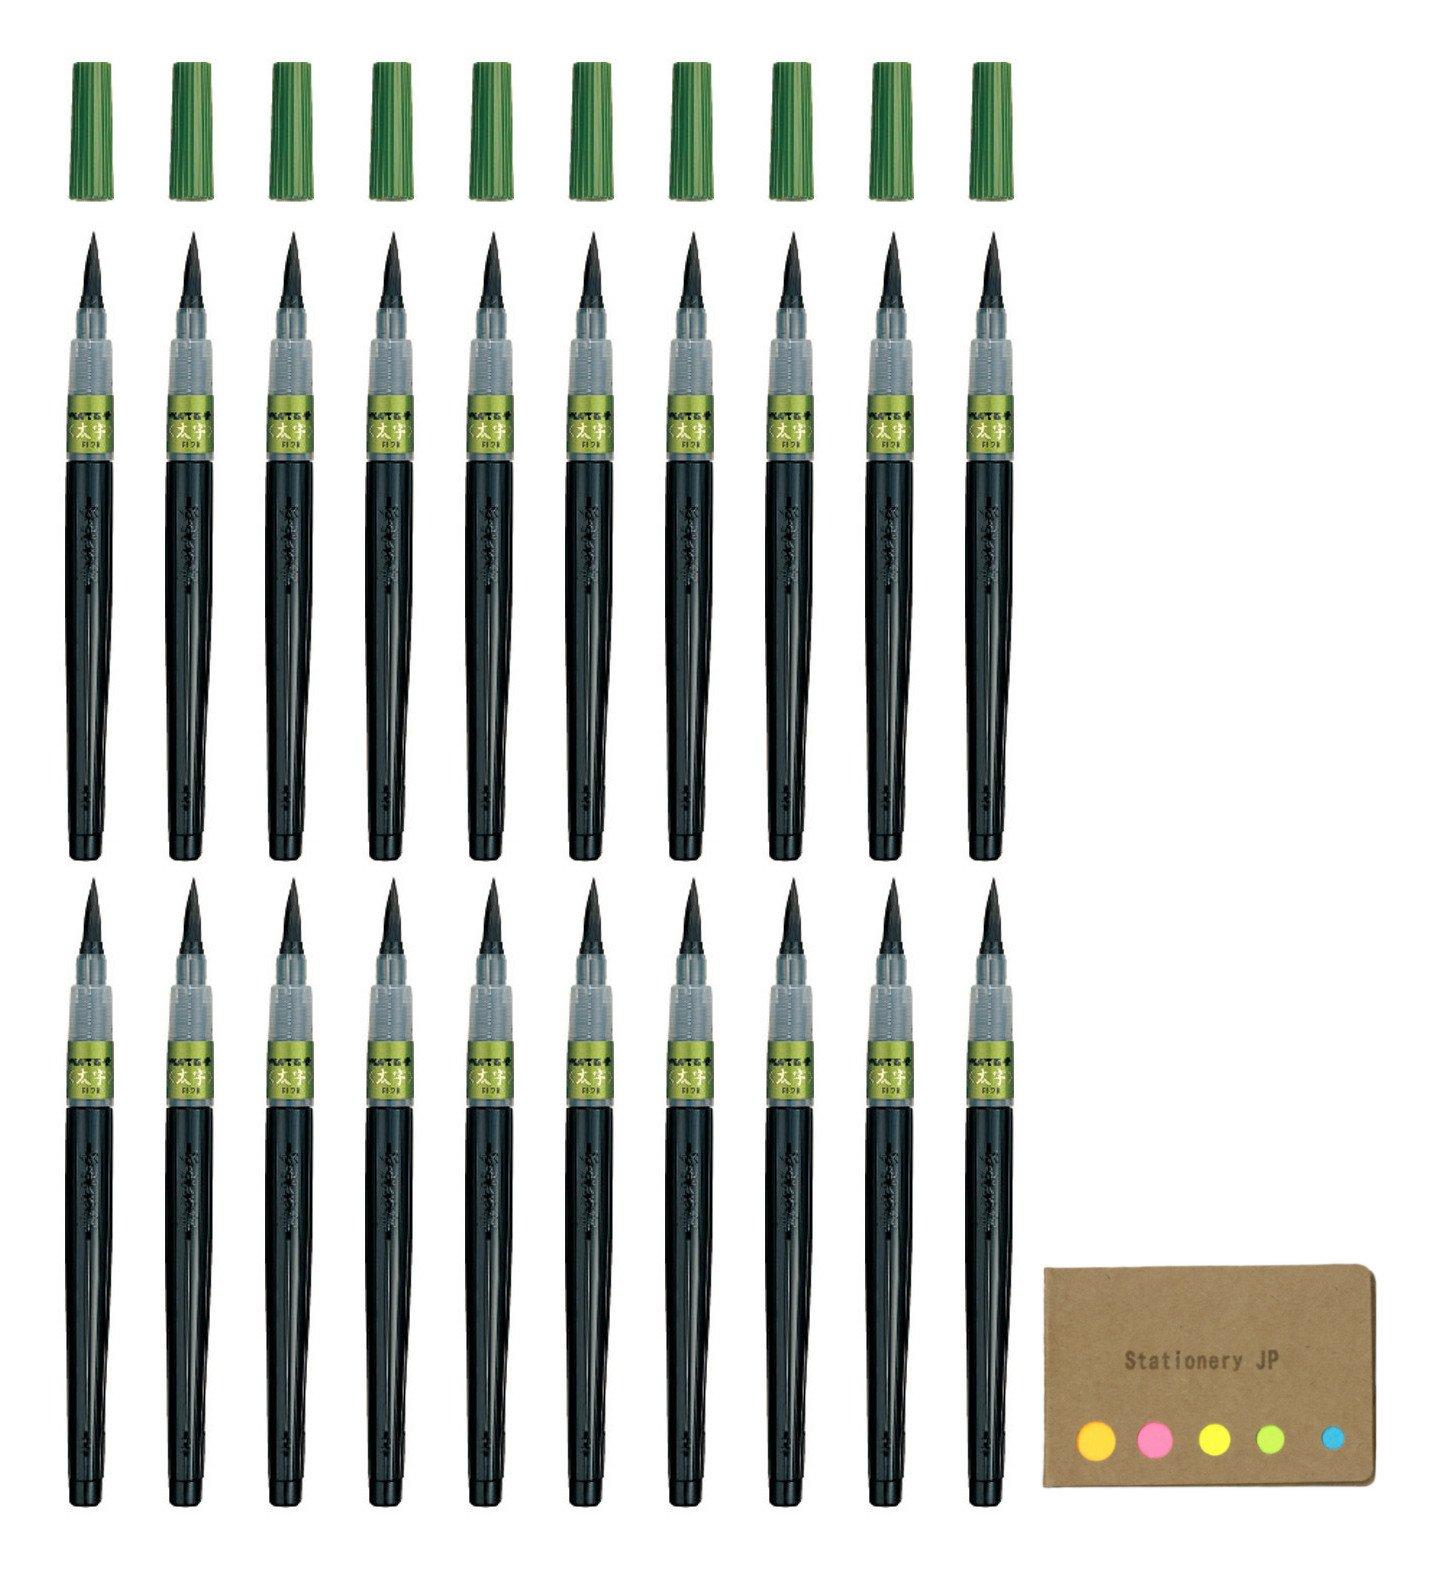 Pentel Fude Brush Pen, Bold, 20-pack, Sticky Notes Value Set